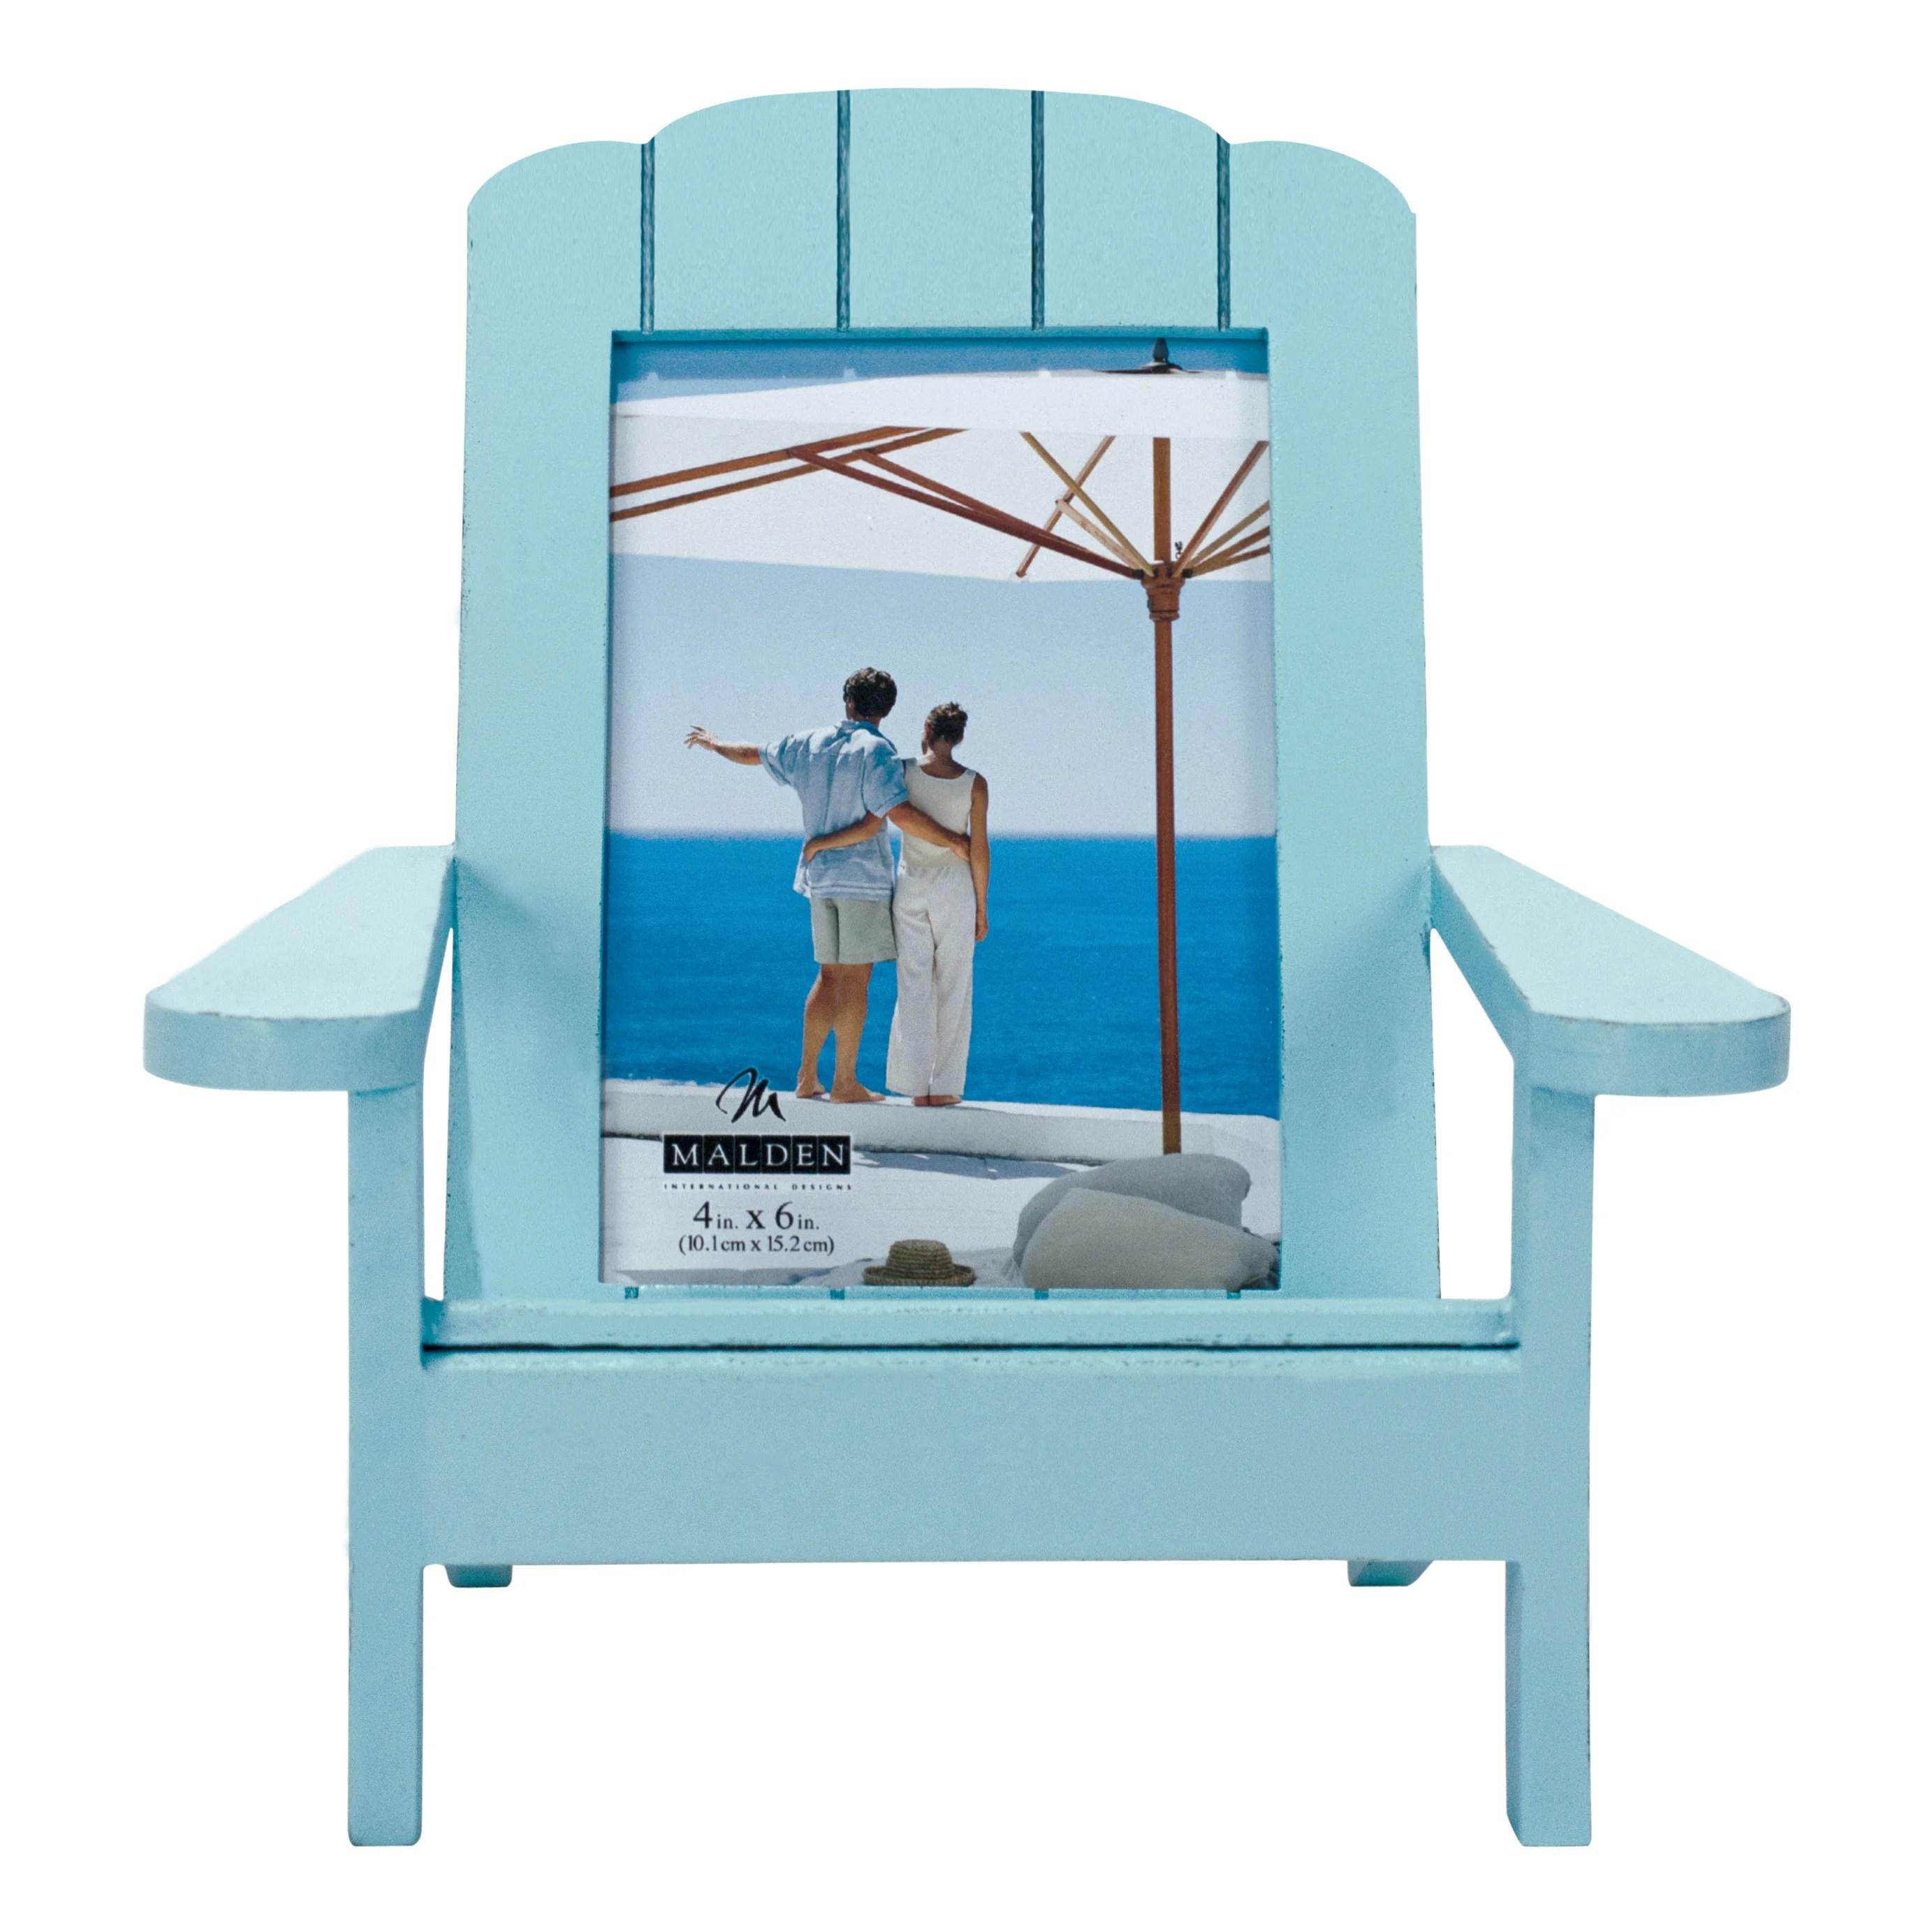 Malden Adirondack Chair Picture Frame & Reviews Wayfair